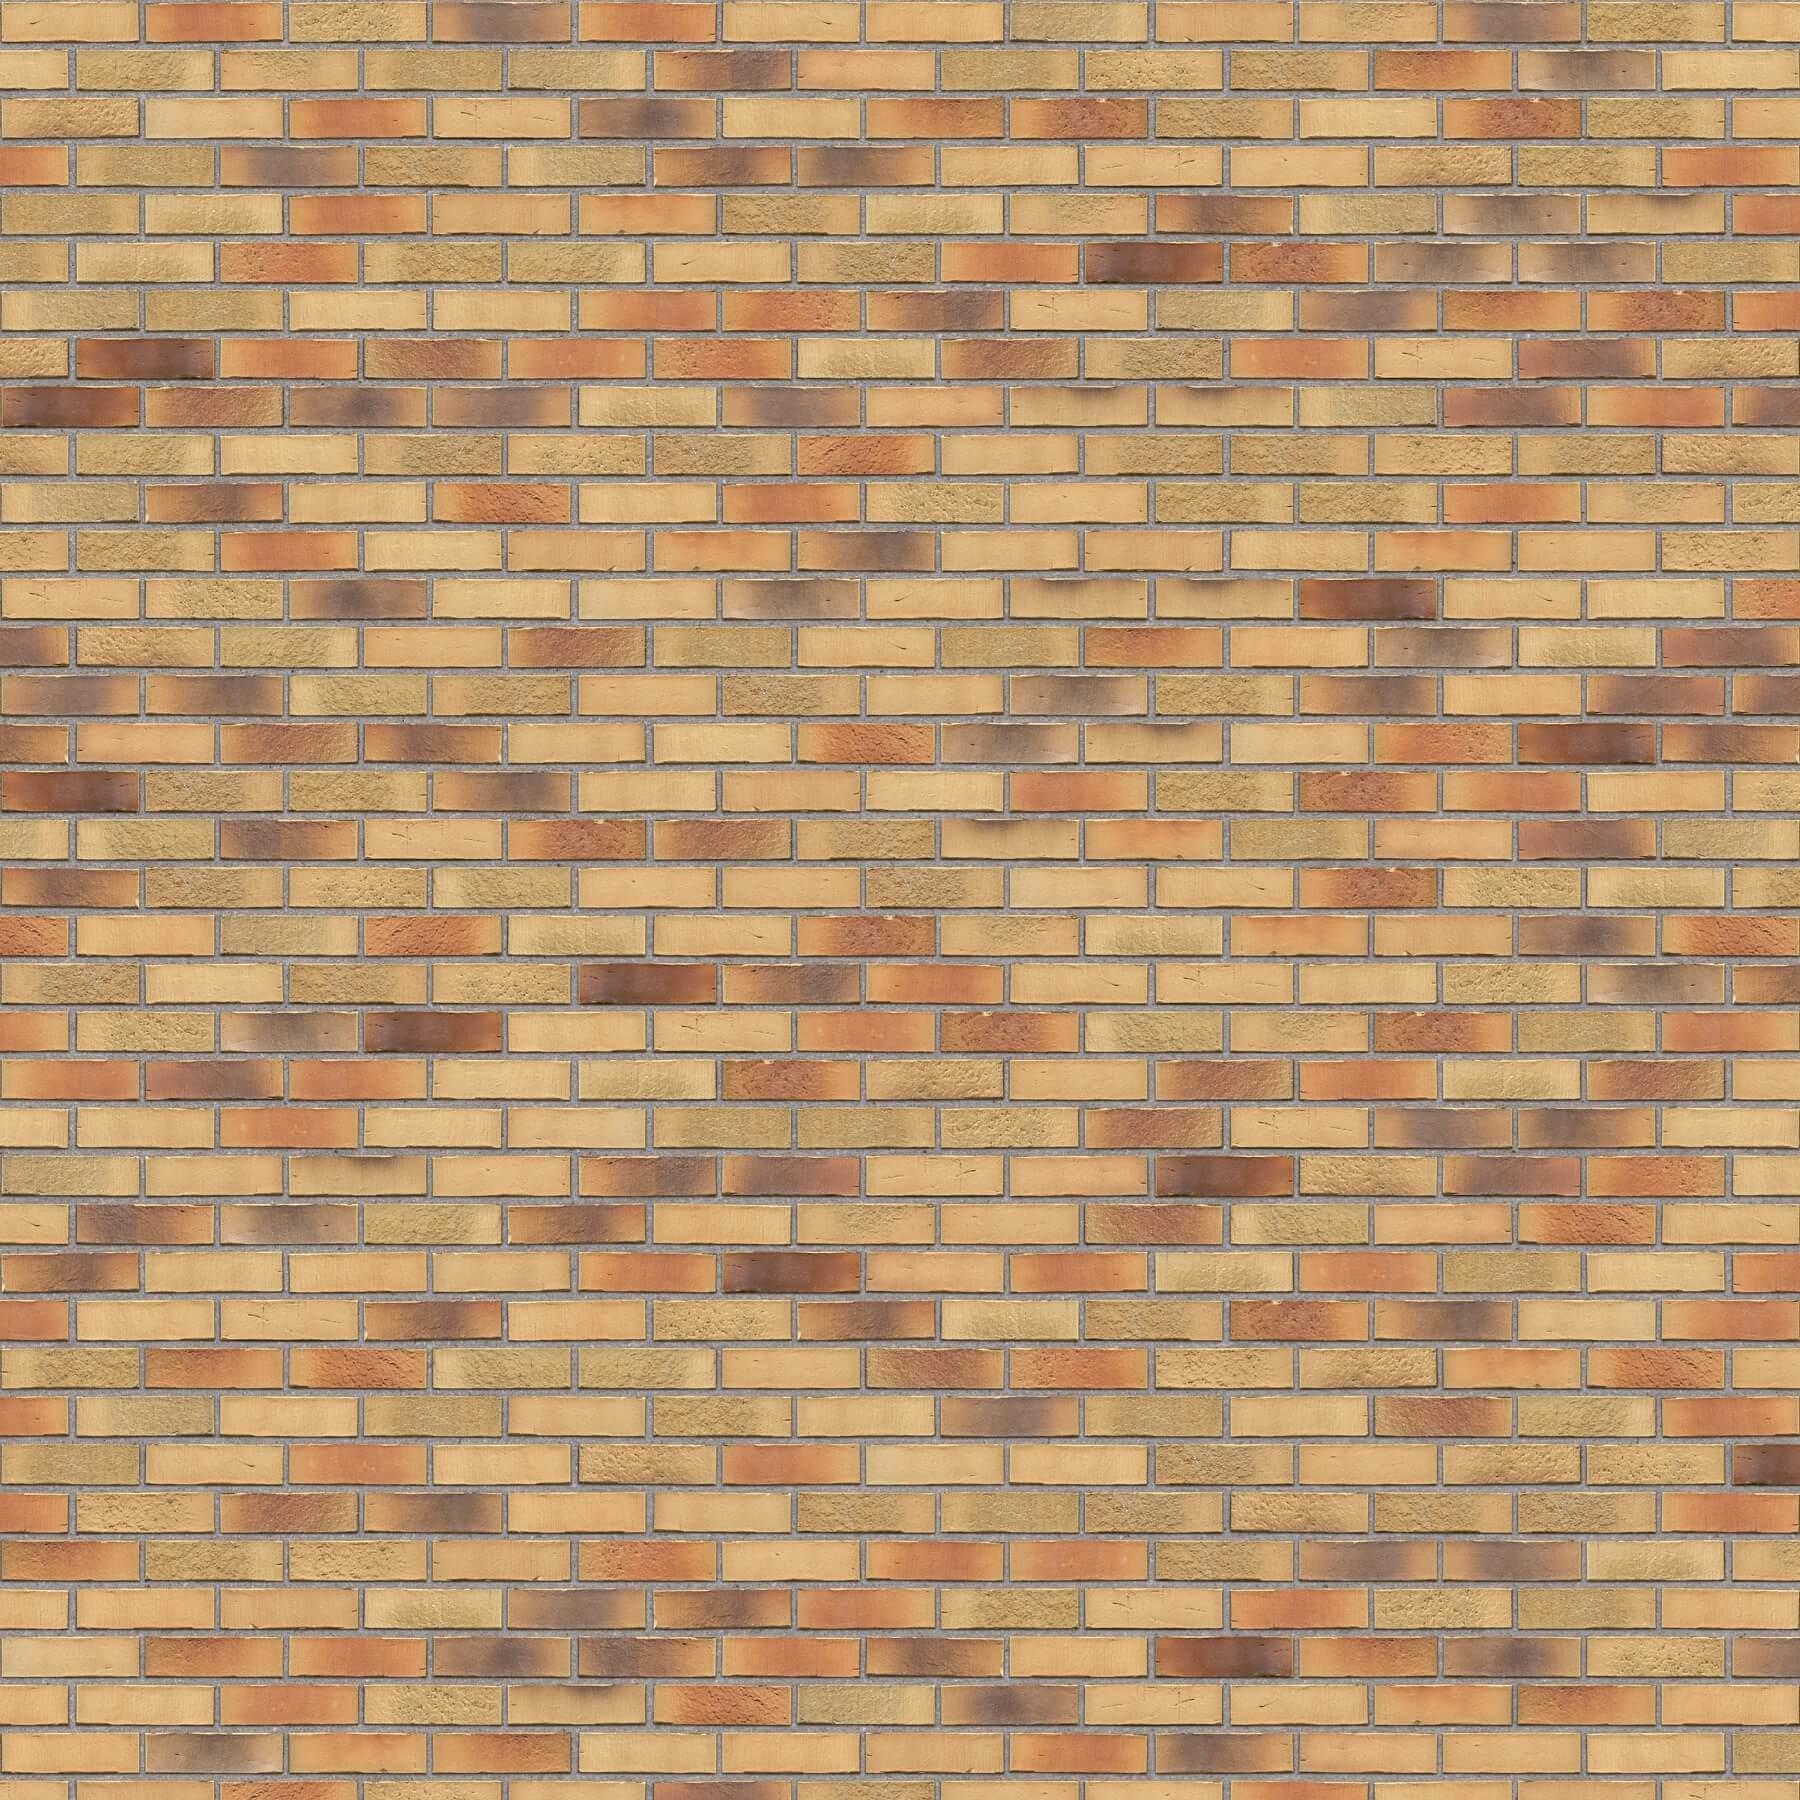 Puna-cigla-FeldHaus-Klinker-brick-house-beograd-nf-k-915-Siva Fuga